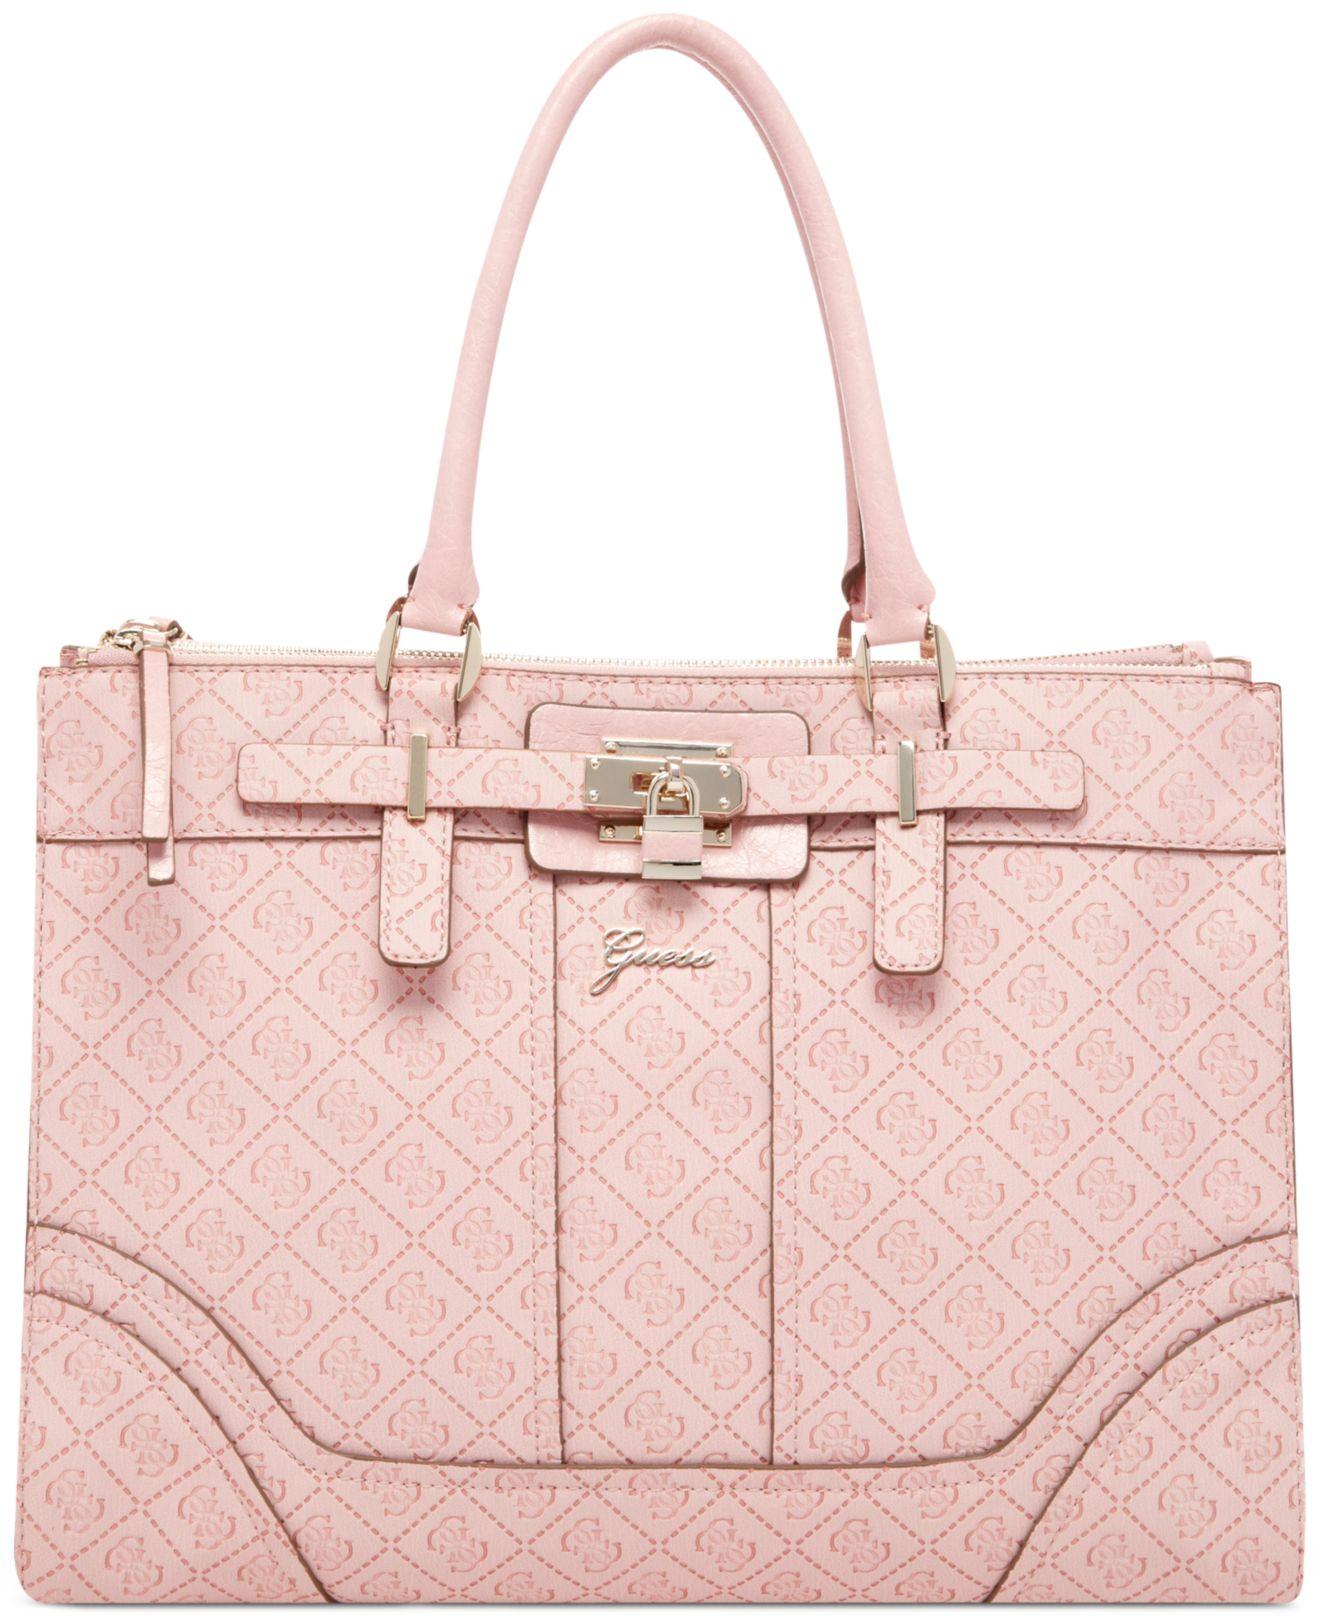 VIDA Tote Bag - White Elegance by VIDA 614Yfk